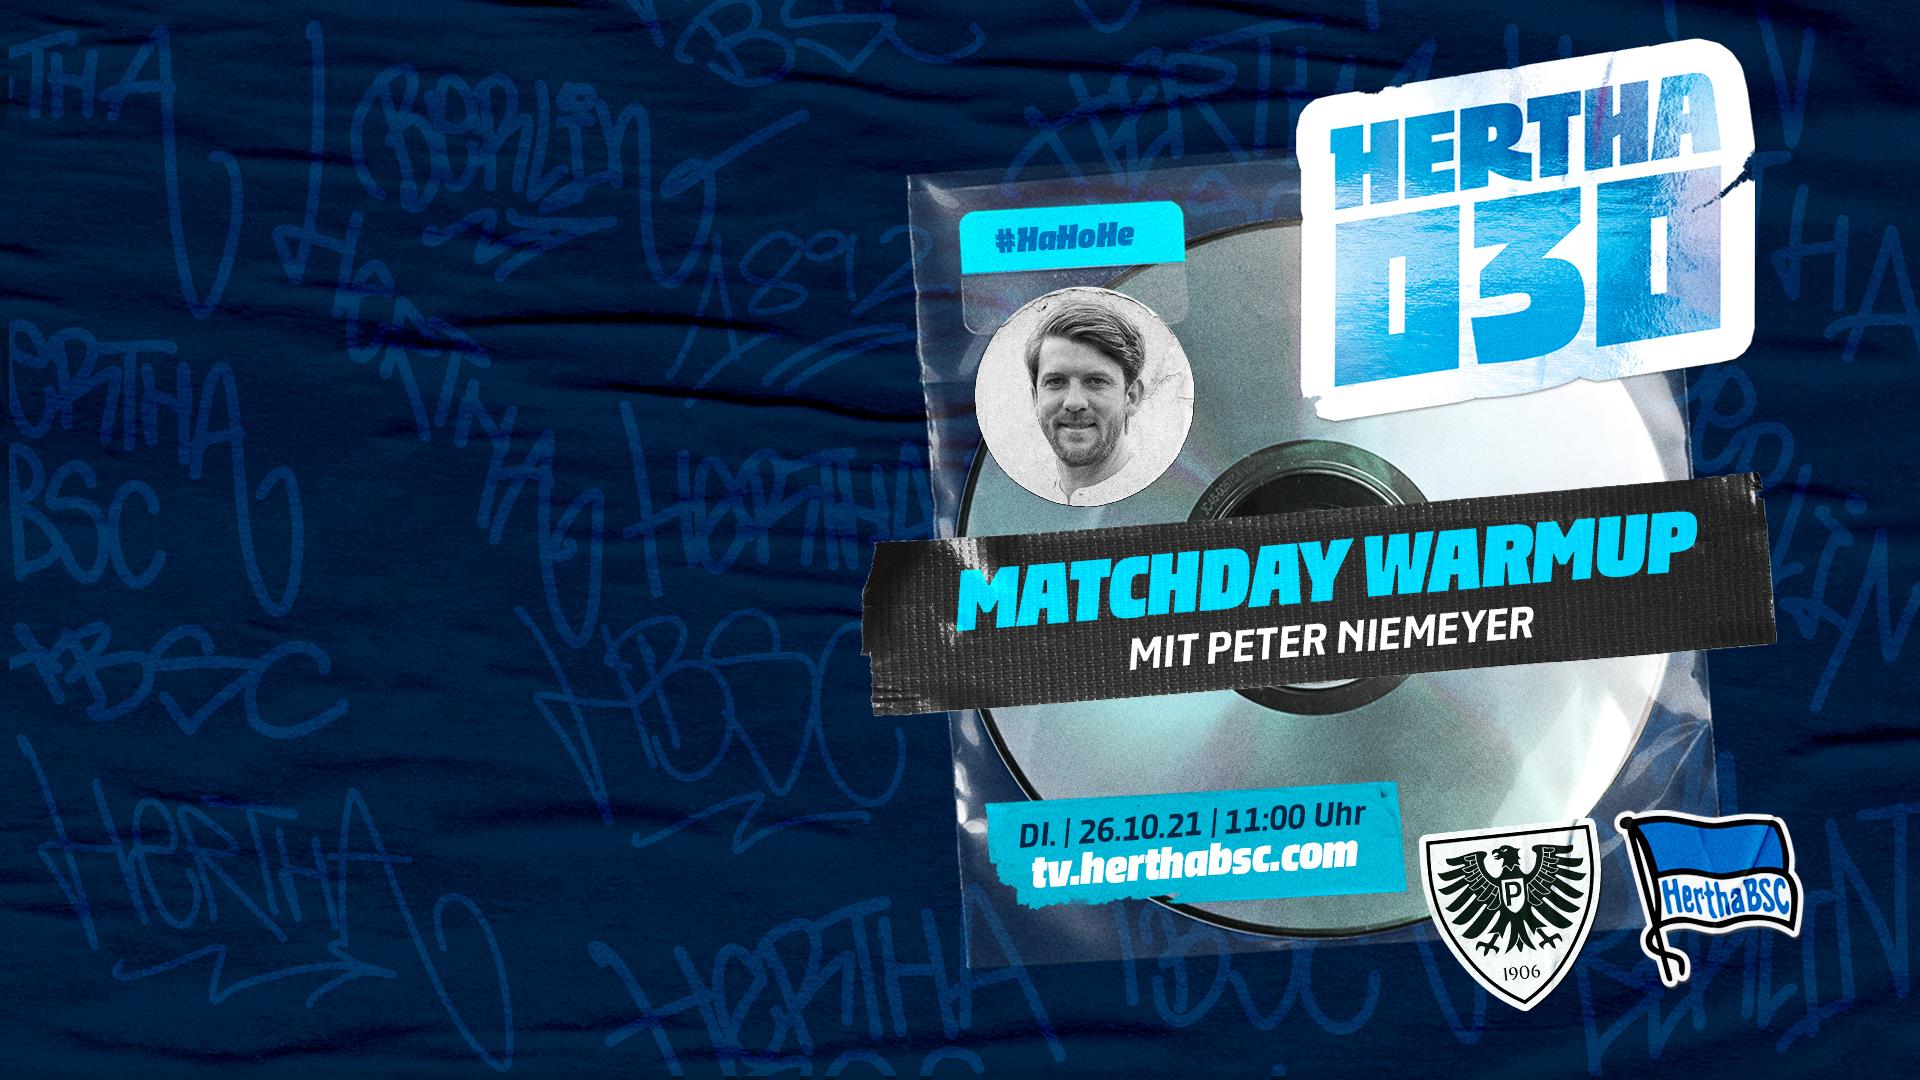 Hertha030 - Matchday Warmup SCPBSC.